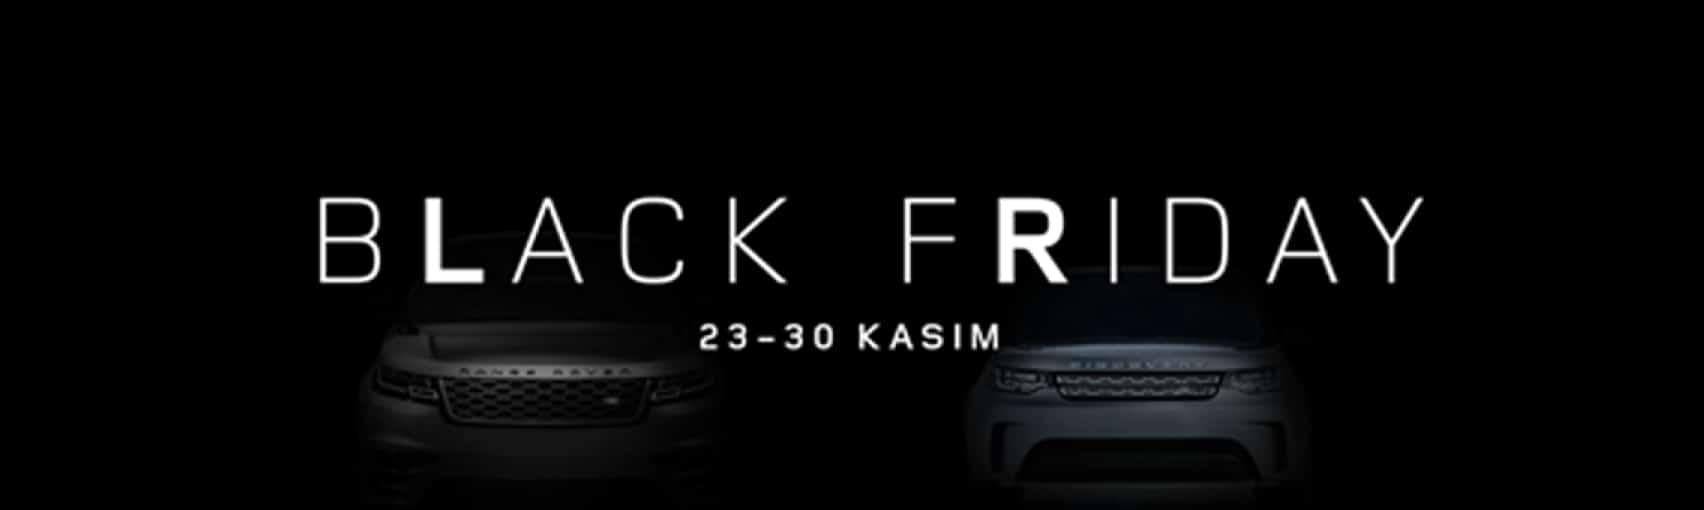 Black-friday-Mobile-Banner